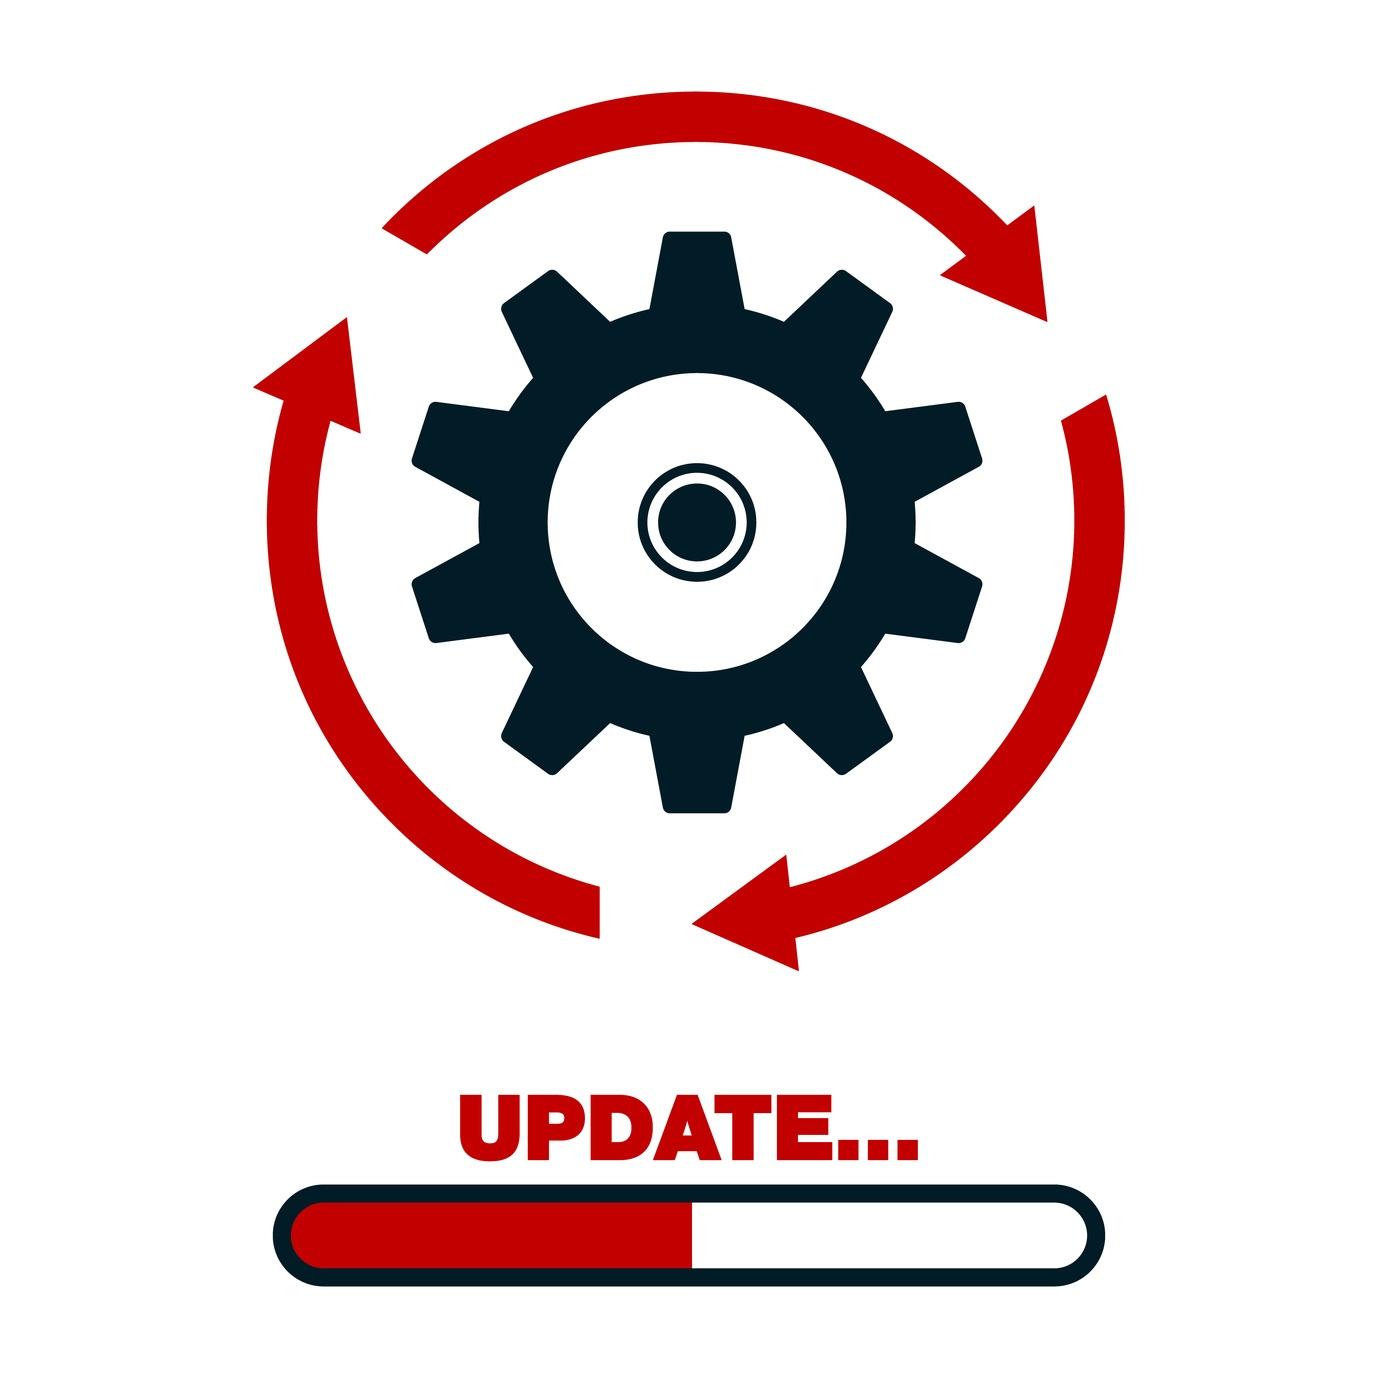 pbcs and epbcs july 2018 updates